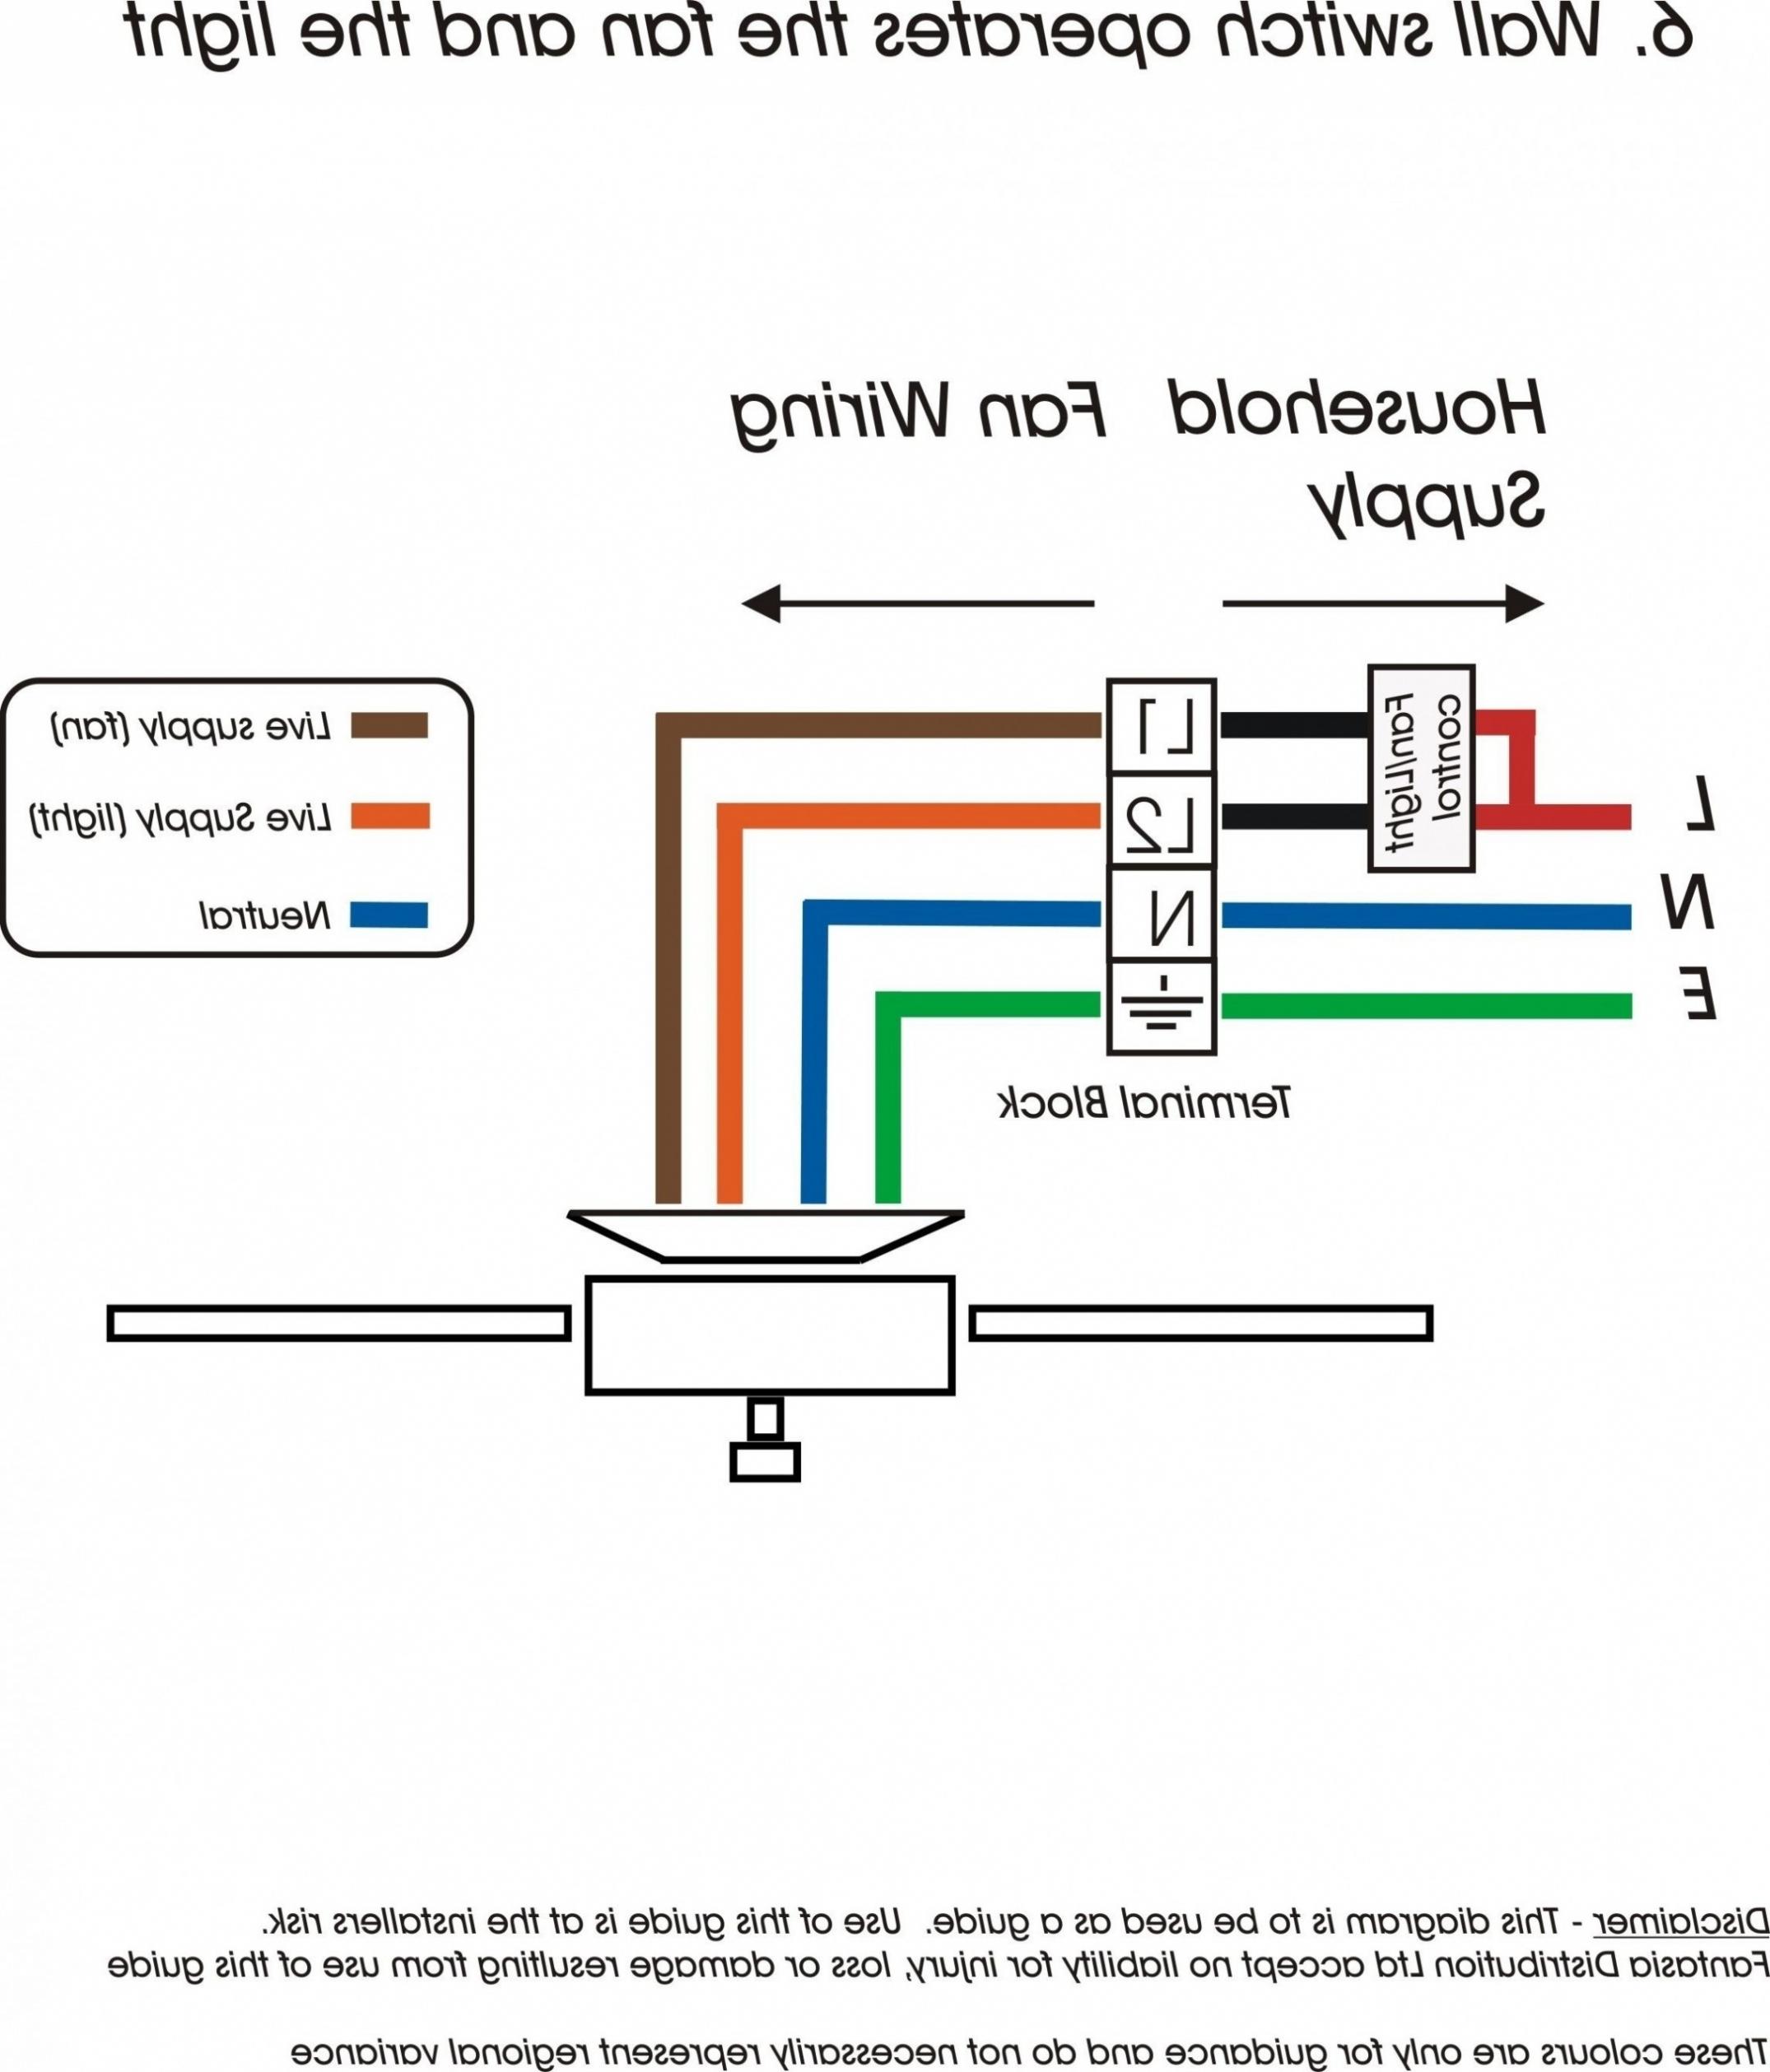 Wiring Diagram For Pir Sensor Fresh 3 Way Motion Sensor Switch – 3 - Motion Sensor Light Switch Wiring Diagram